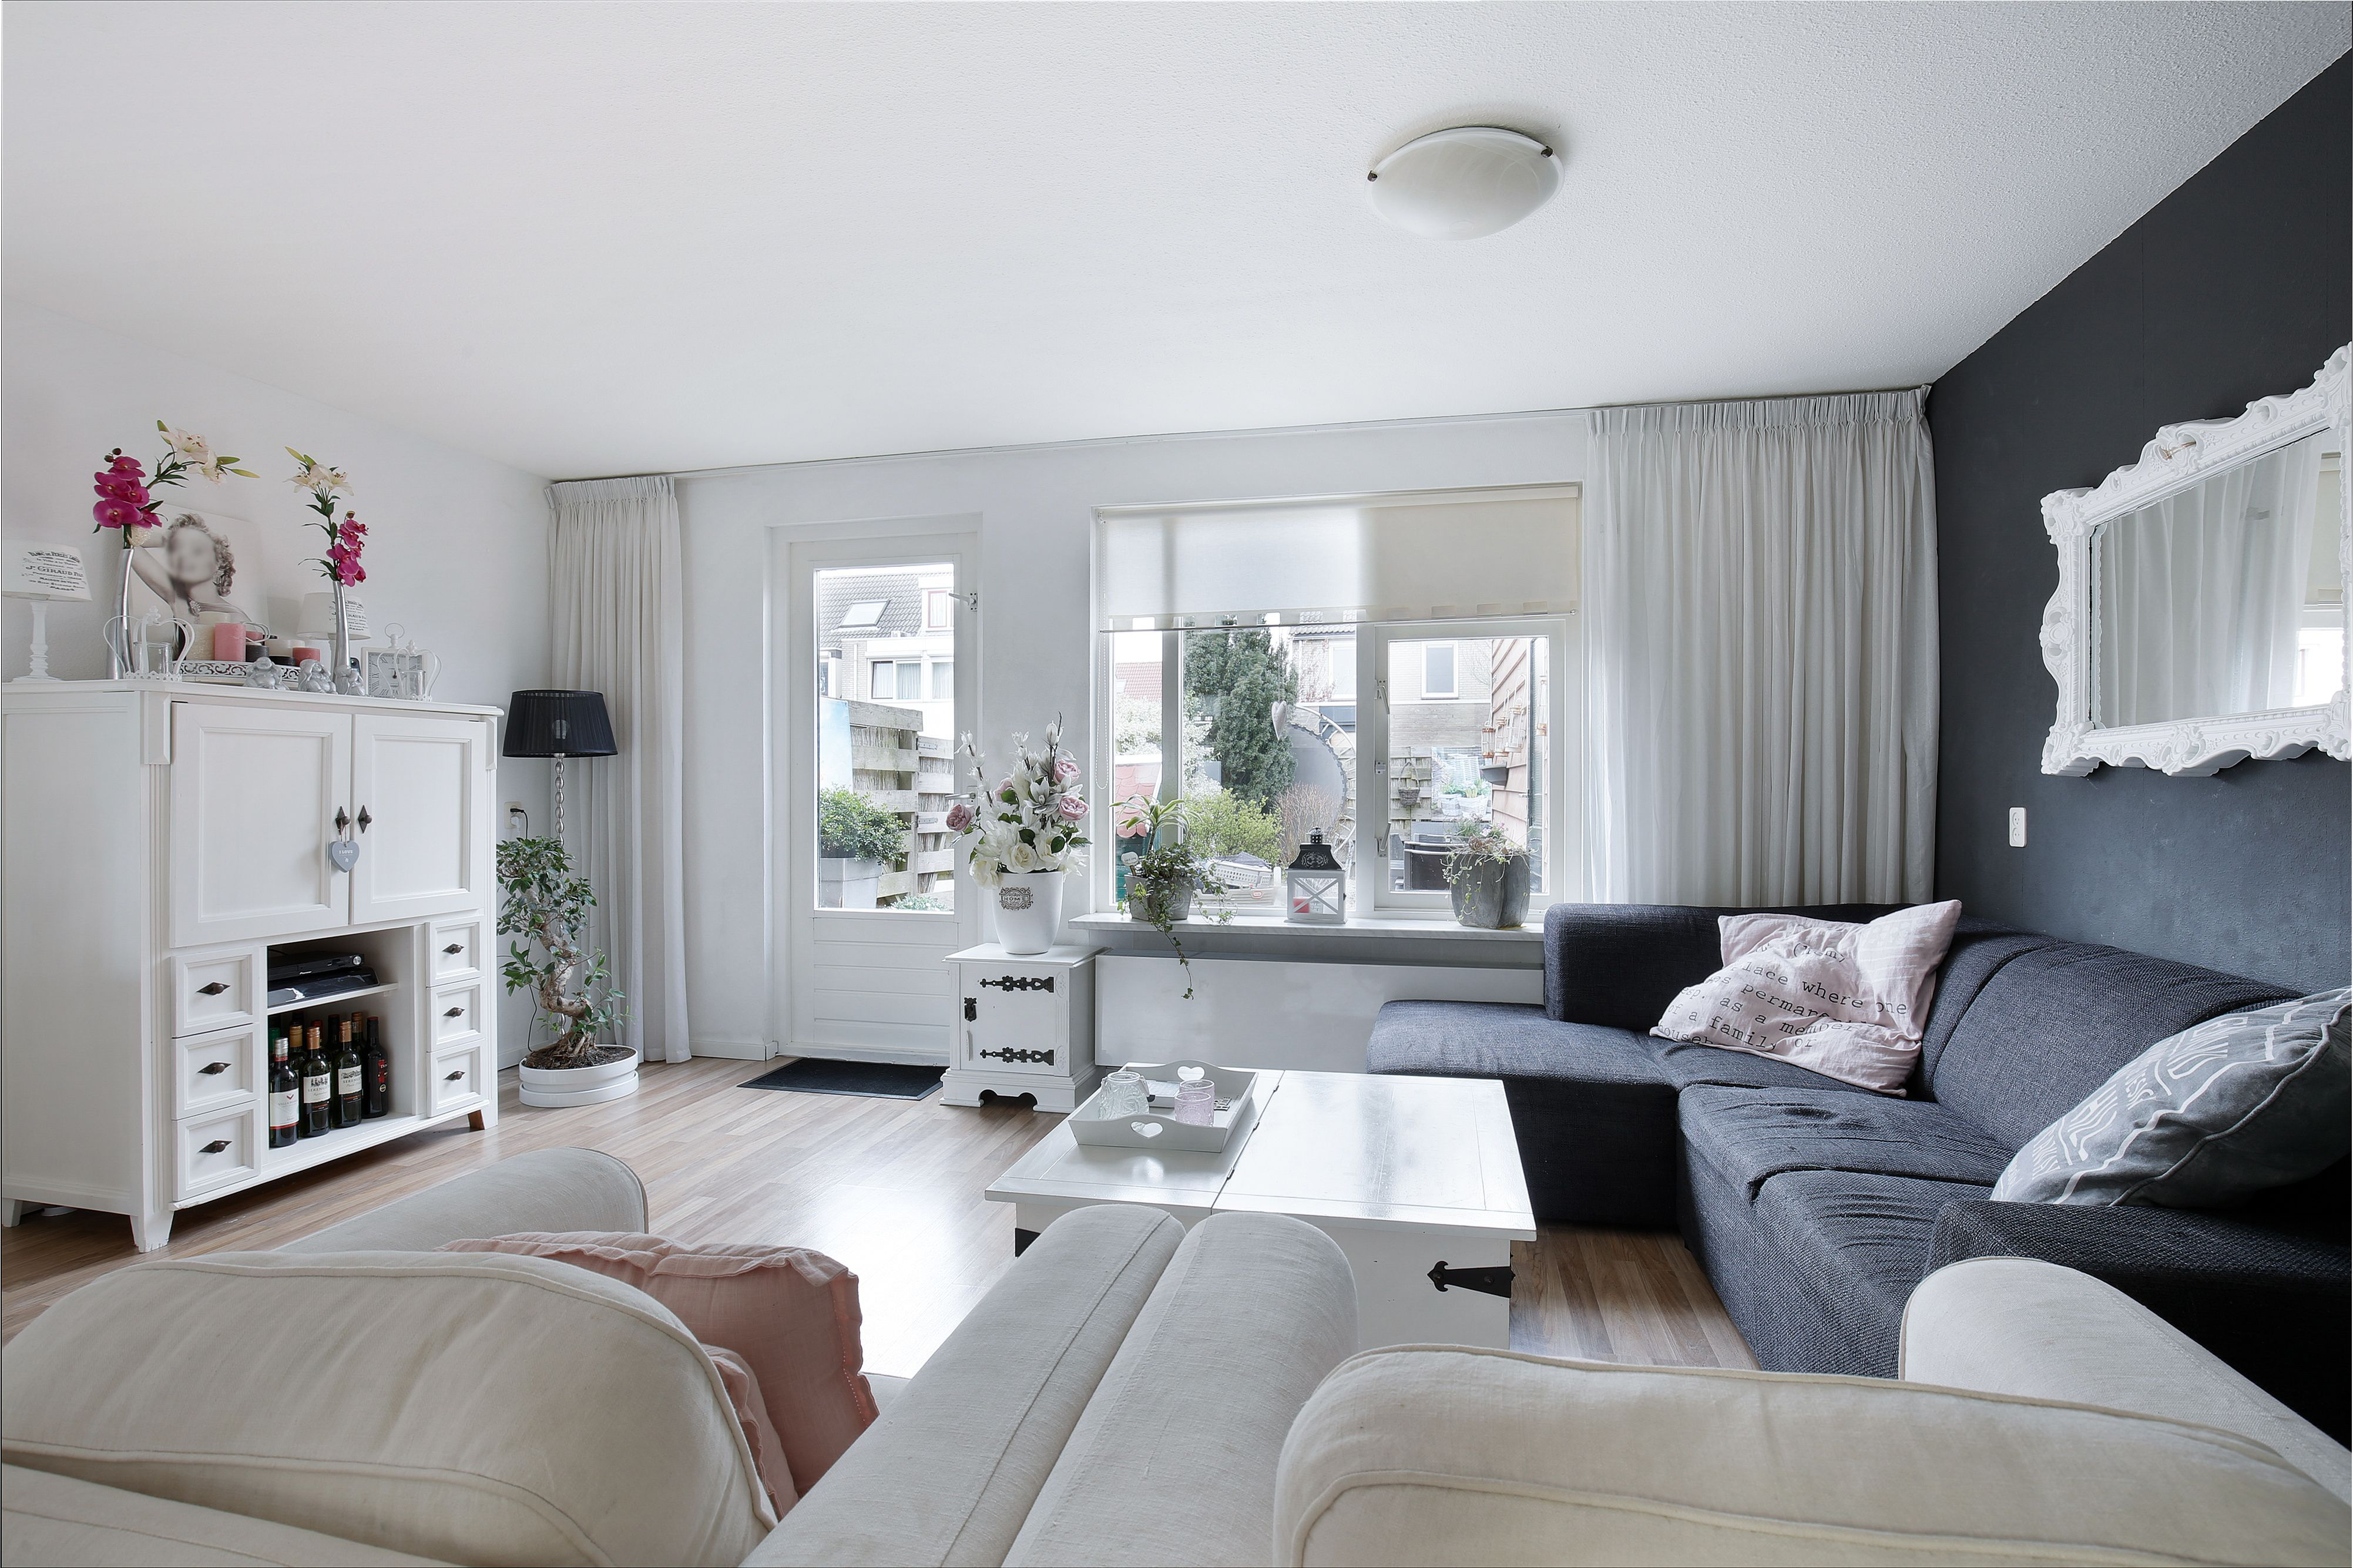 Sfeervolle woonkamer met donkere en lichte kleuren. - Woonkamers ...